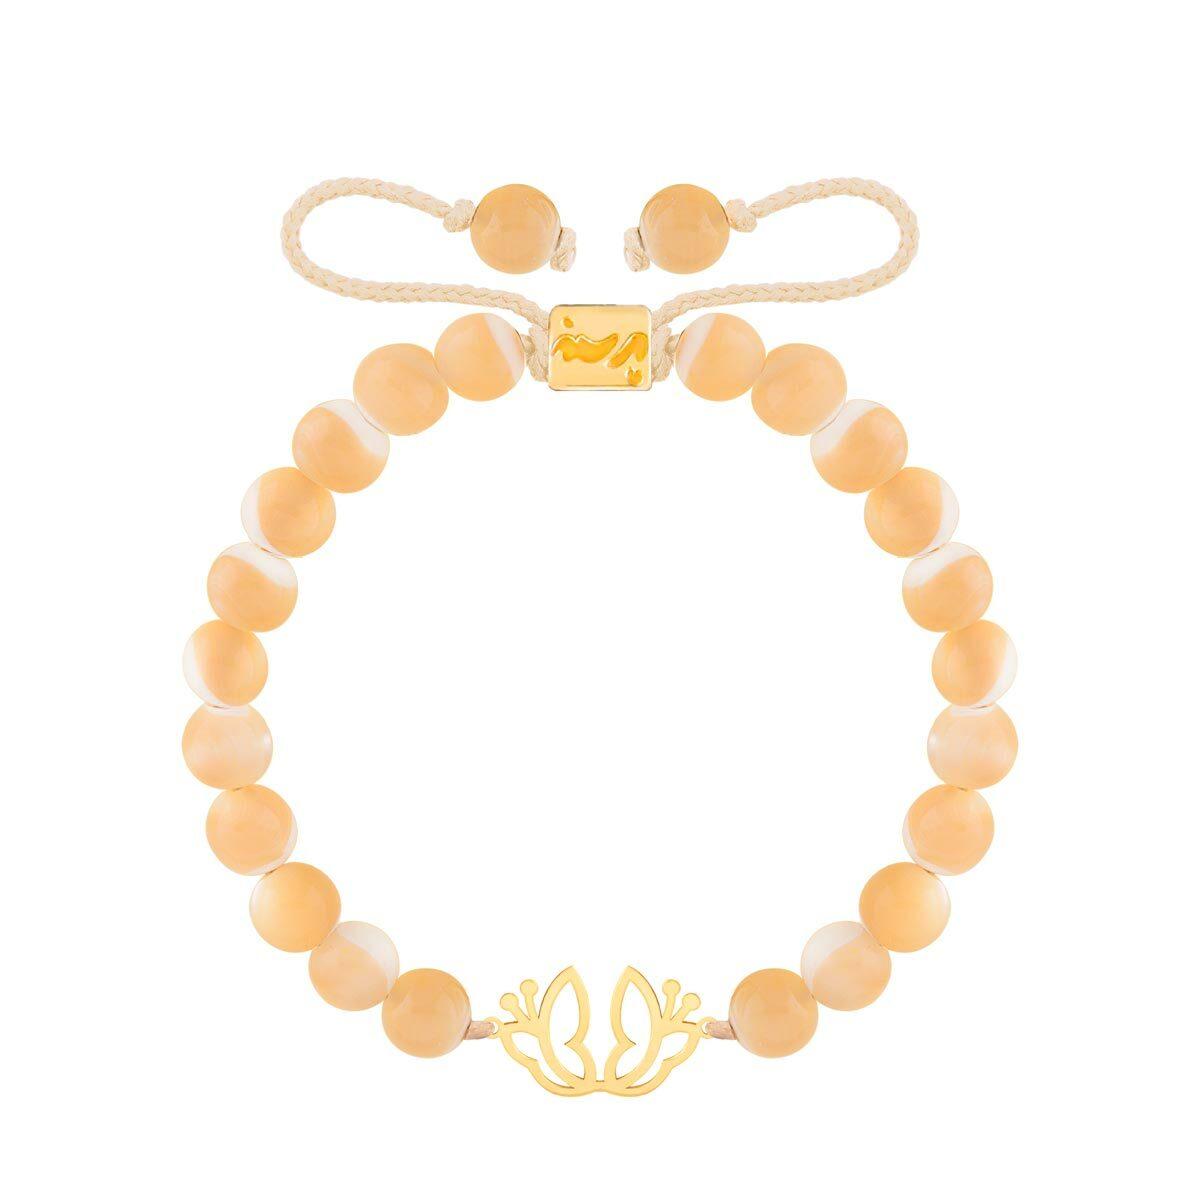 دستبند طلا سنگی دو پروانه